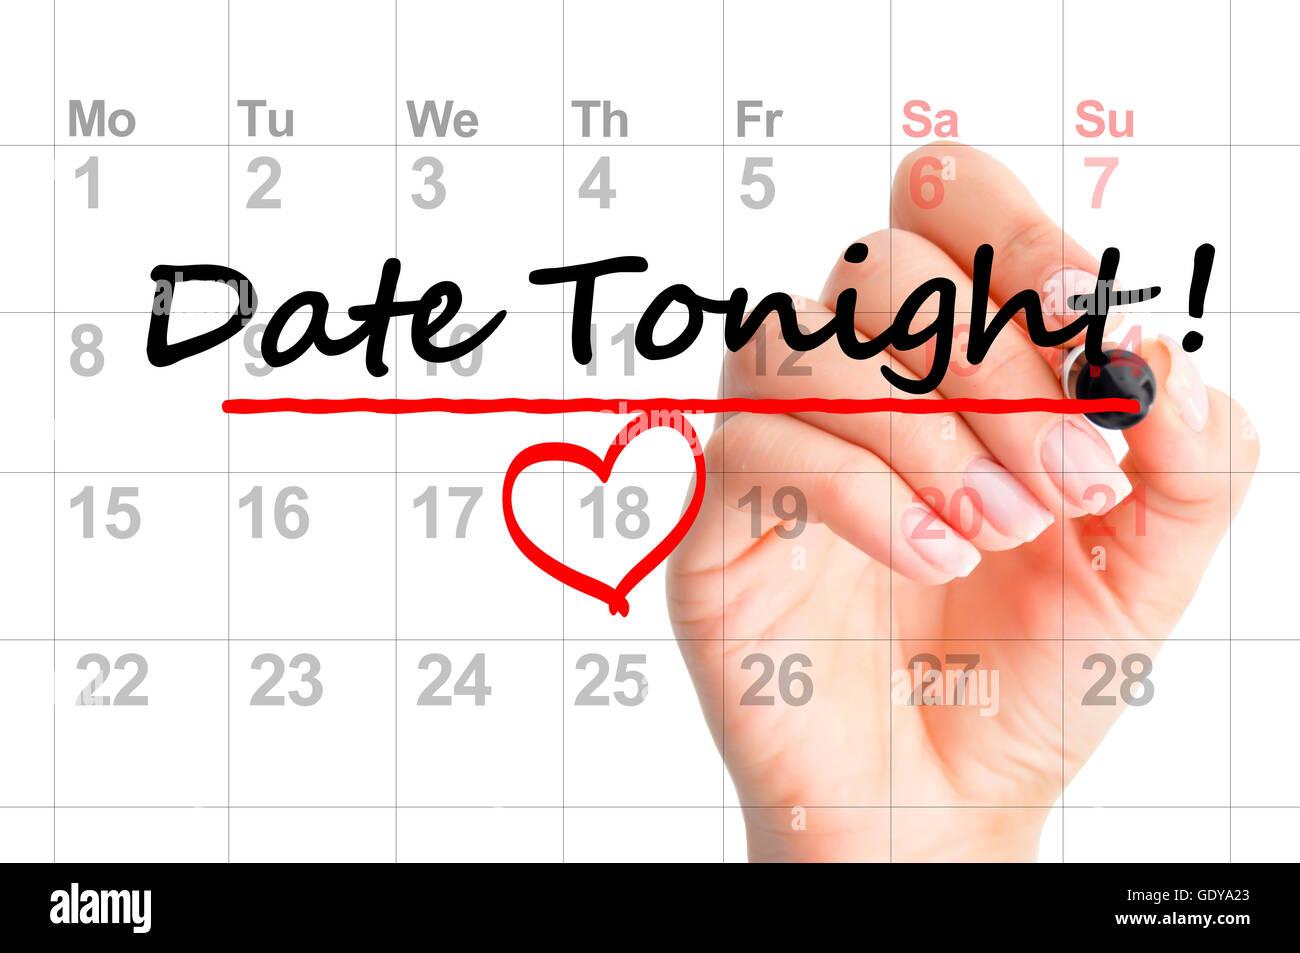 Date tonight marked on calendar - Stock Image